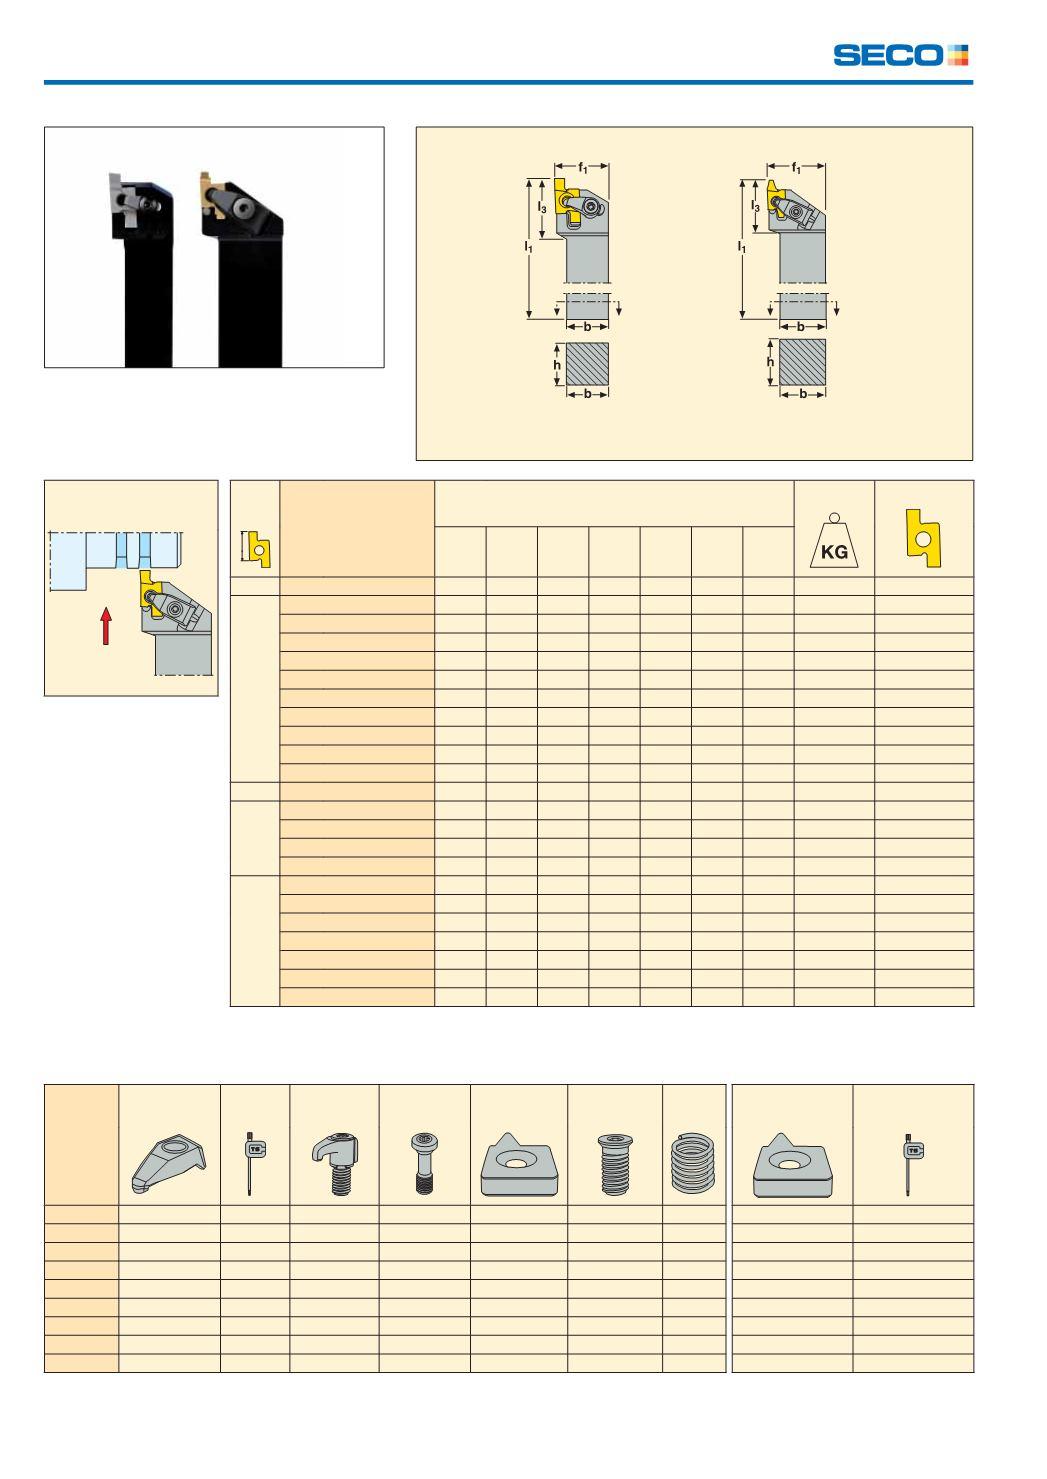 page0604 katalog seco toczenie  at metegol.co